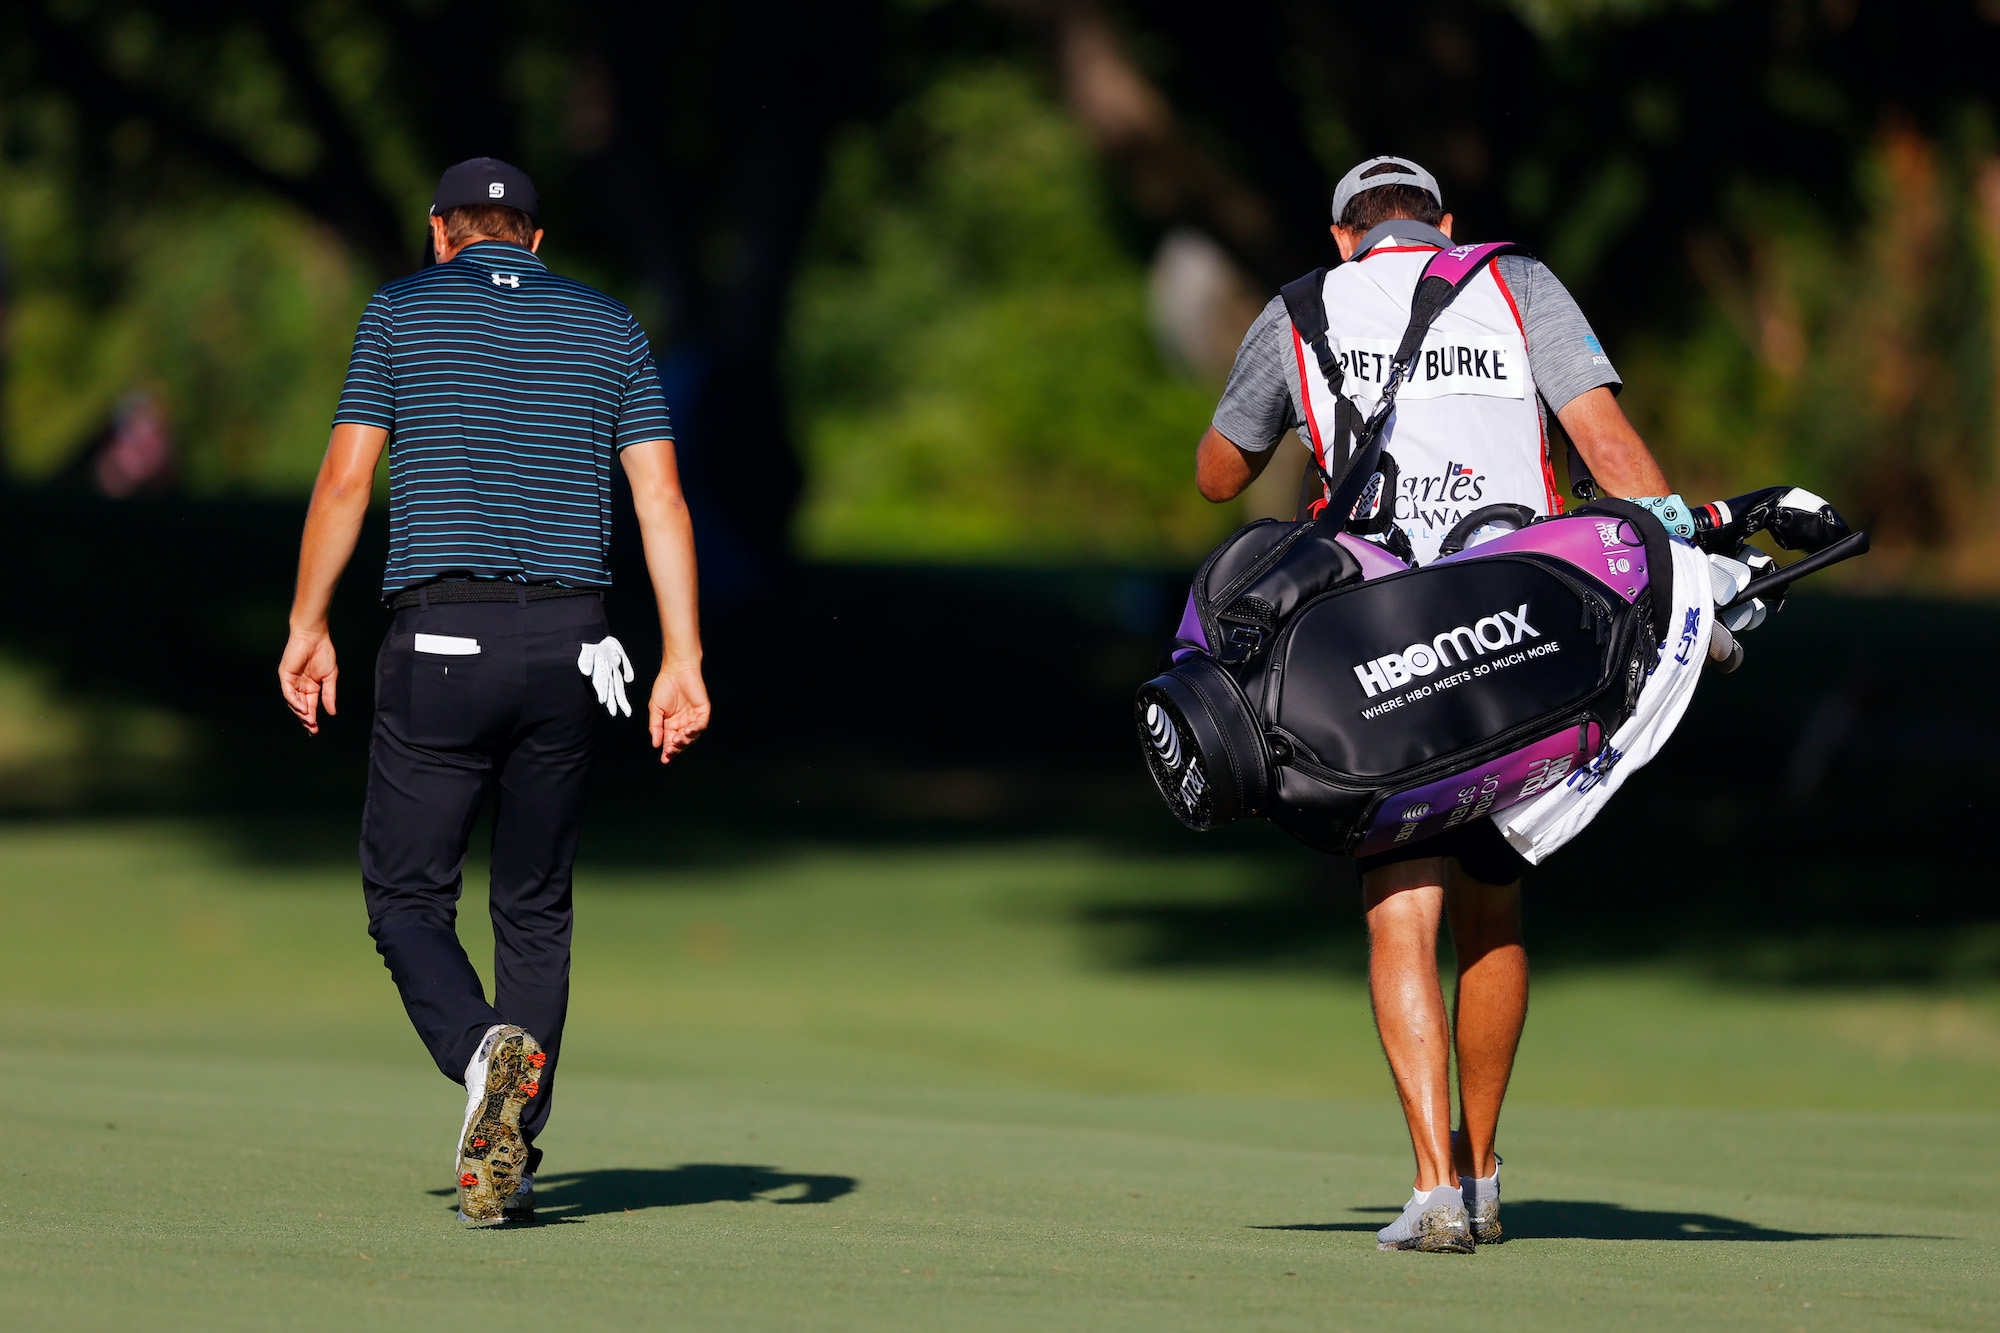 2020 Charles Schwab Challenge: Round 2 - Jordan's New HBO Max Golf Bag